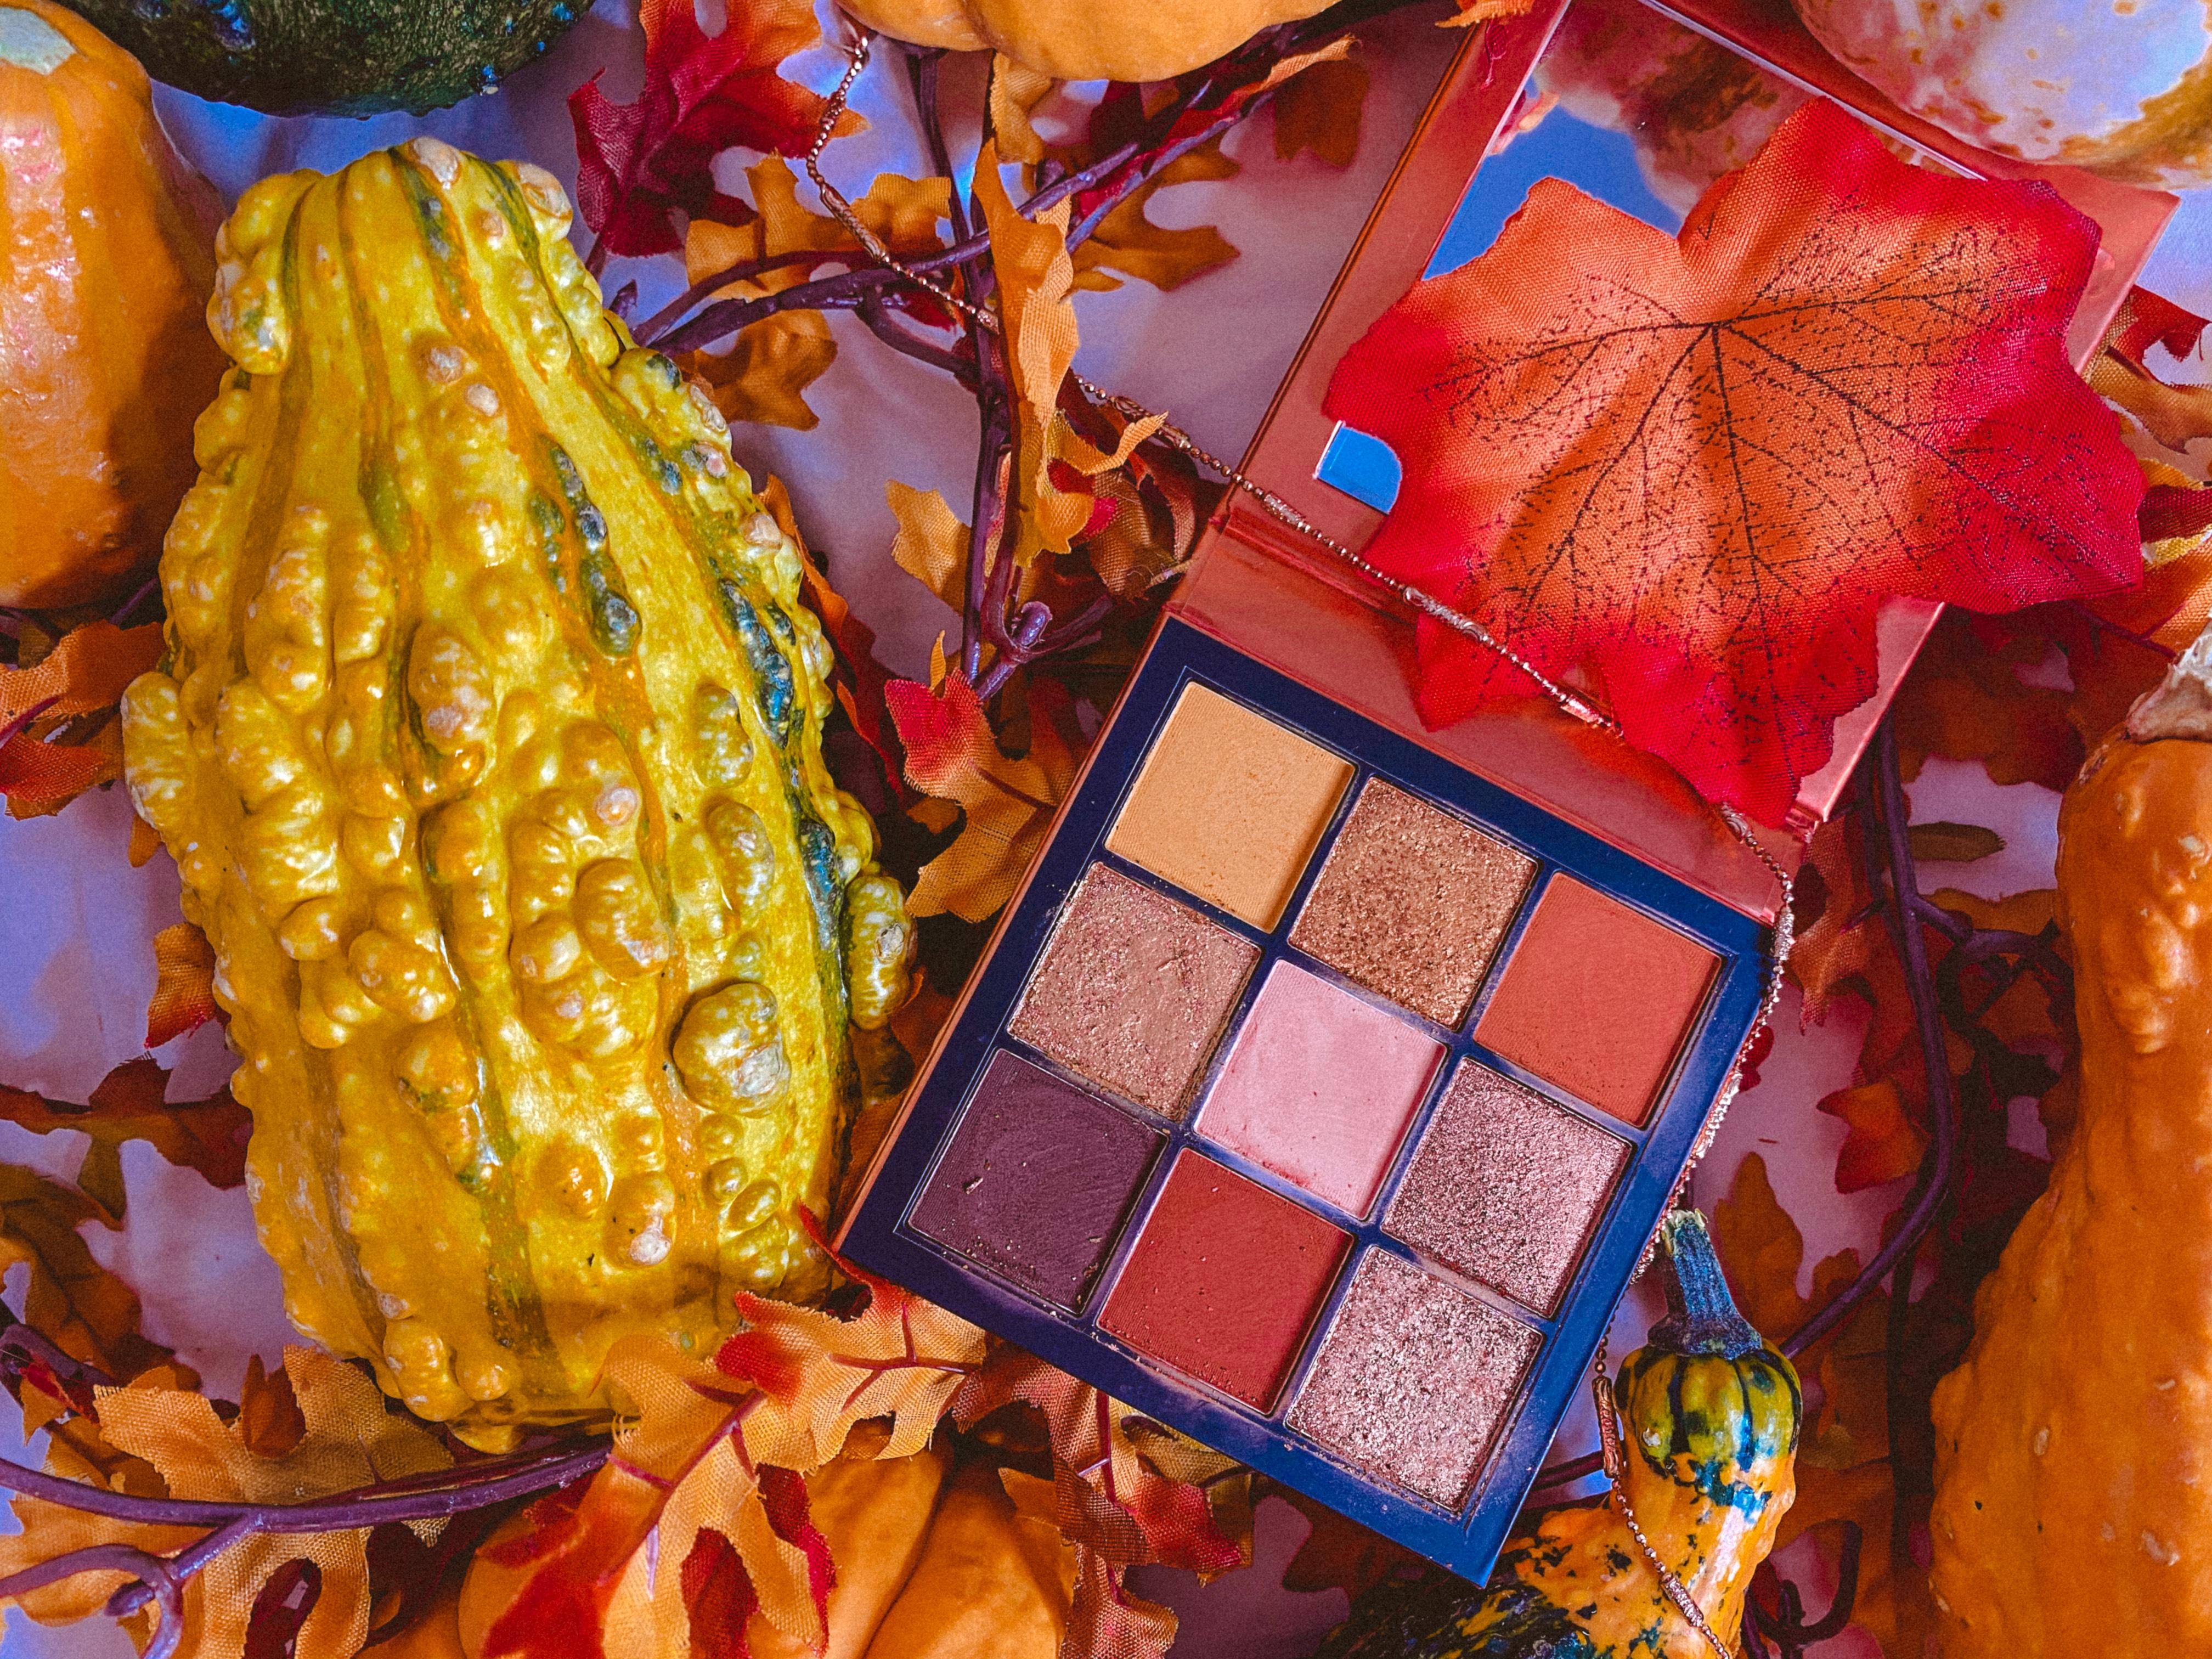 Huda Beauty Topaz Obsessions Palette